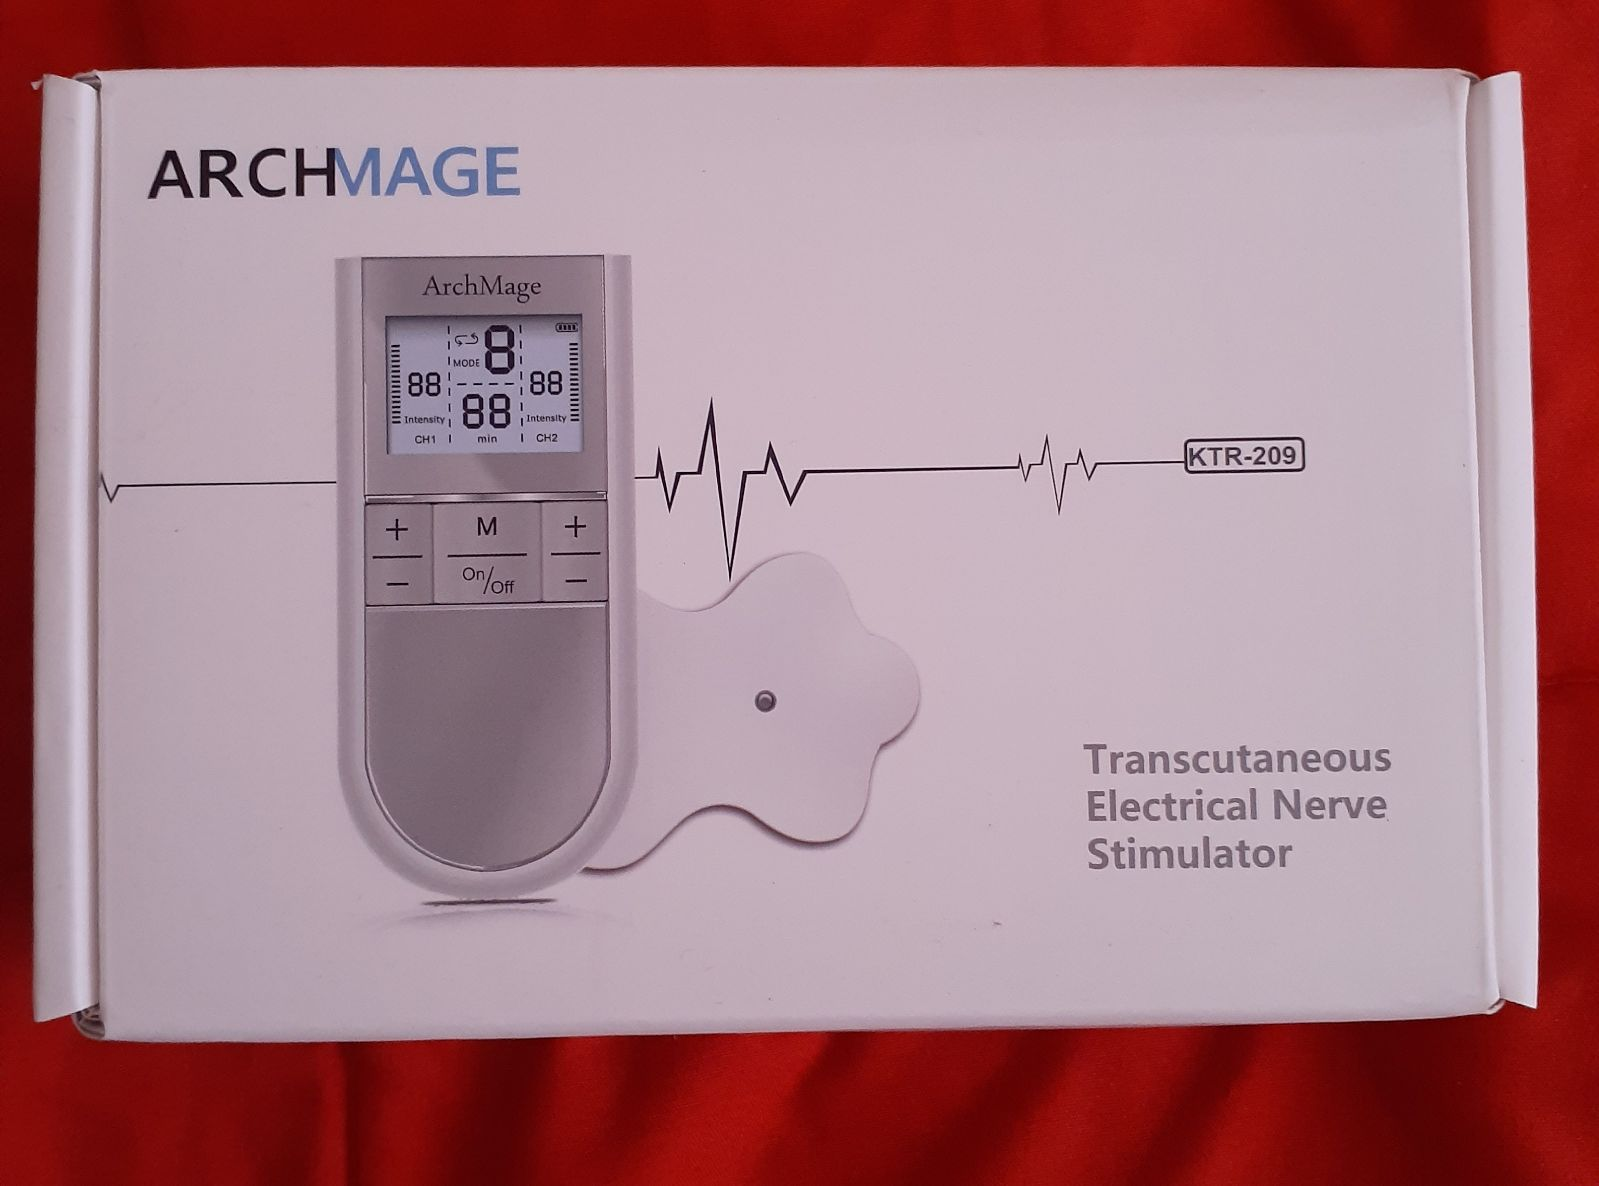 New electrical nerve stimulator